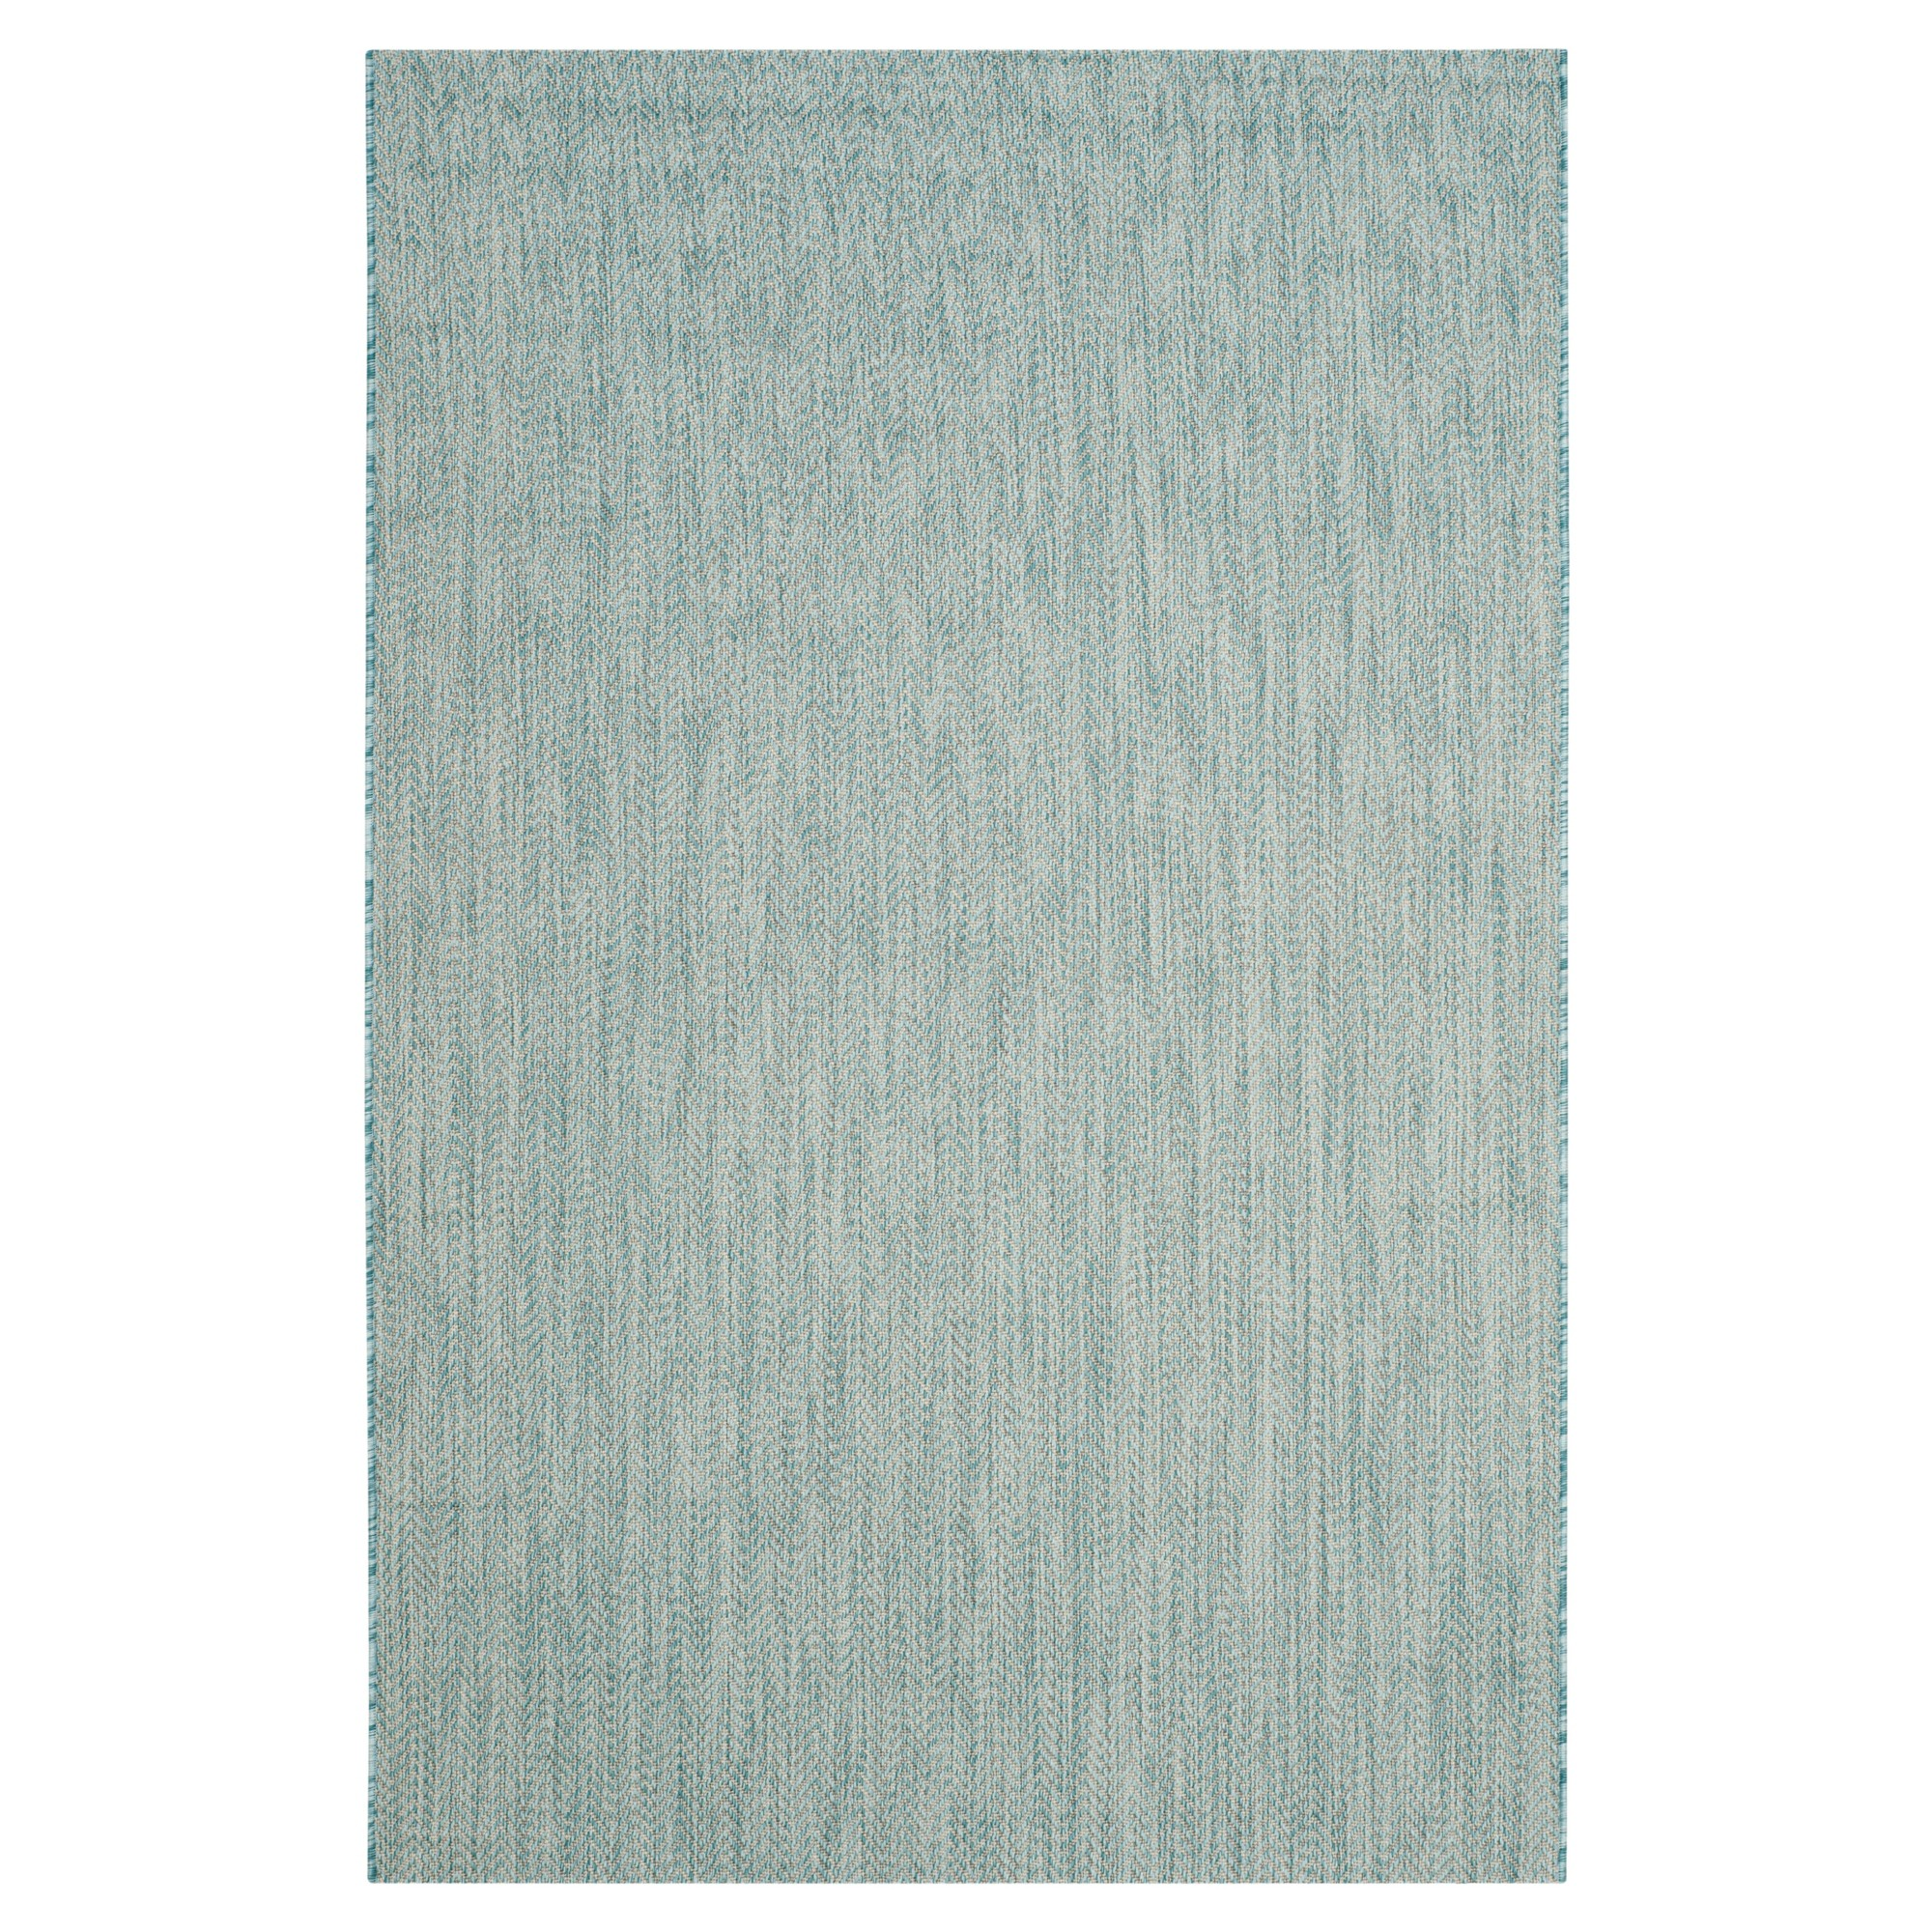 Positano Rectangle 4' X 5'7 Outdoor Rug - Aqua / Gray - Safavieh, Blue